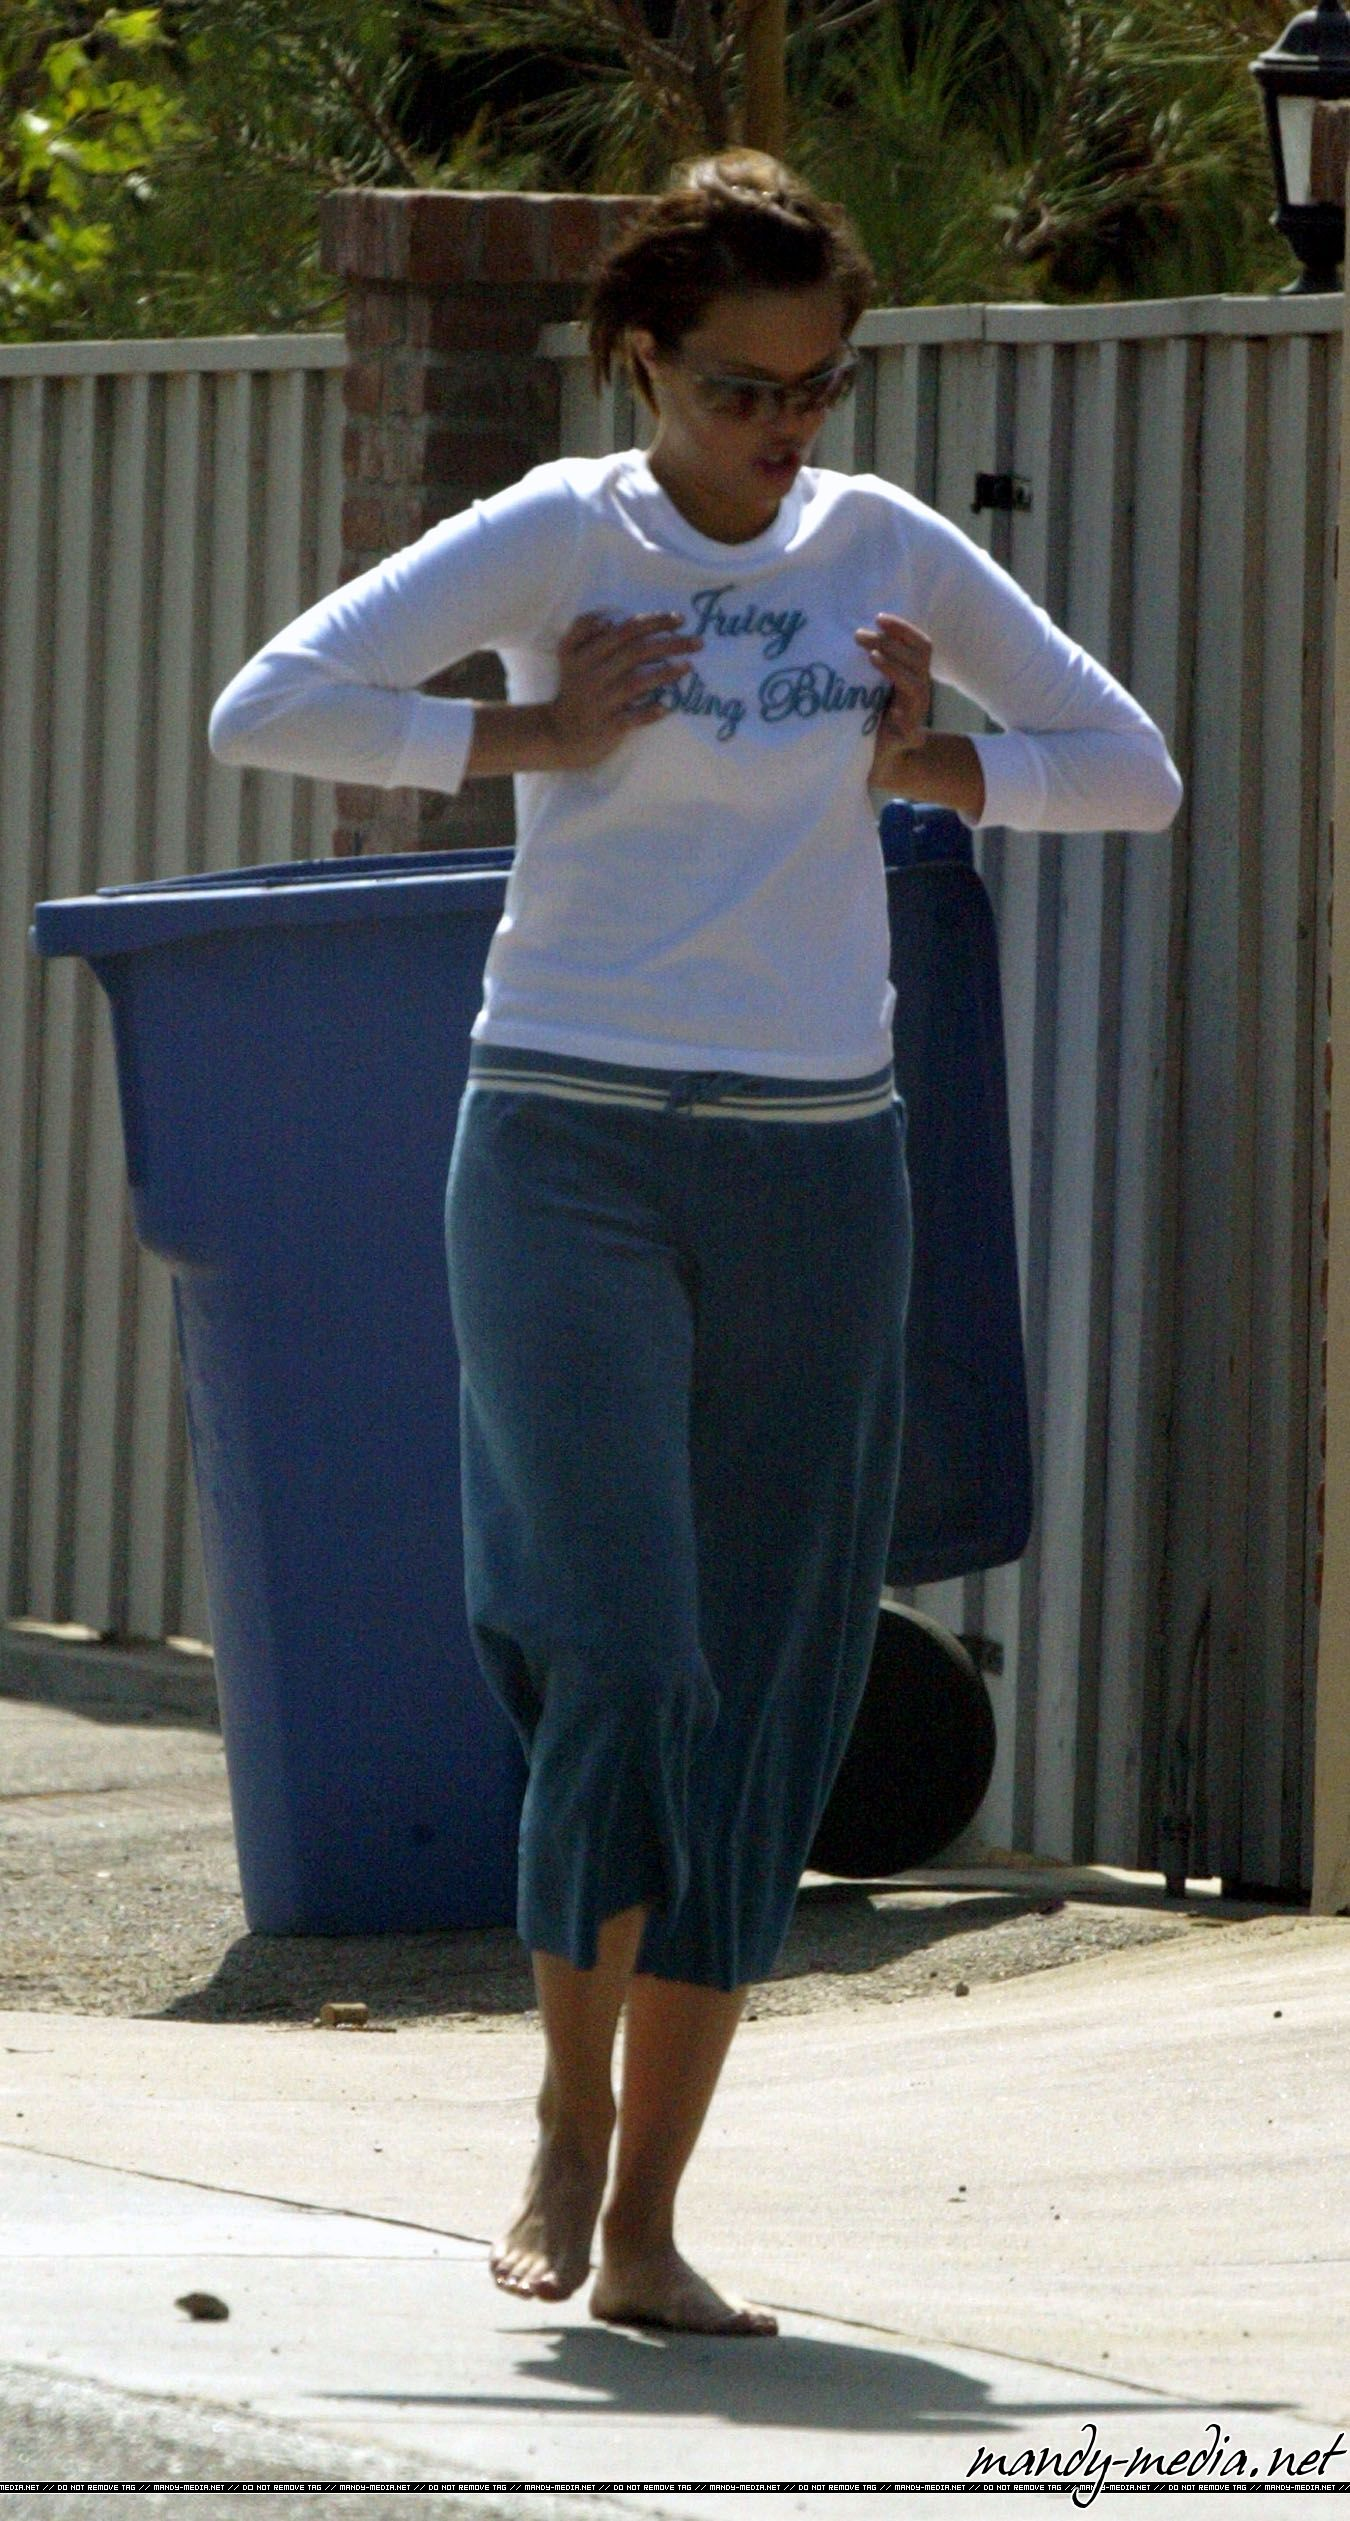 https://pics.wikifeet.com/Mandy-Moore-Feet-501364.jpg